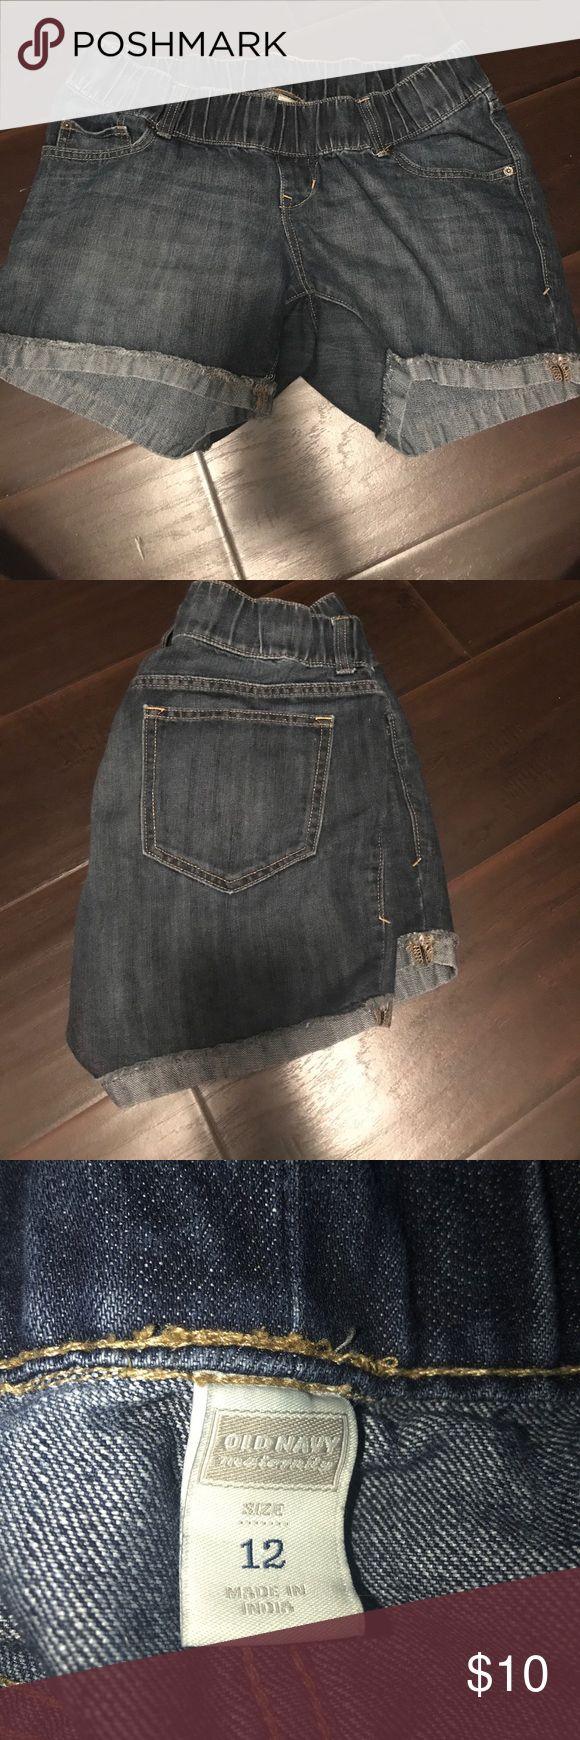 Old Navy Maternity jean shorts Old Navy Maternity jean shorts size 12. Good condition! Old Navy Shorts Jean Shorts